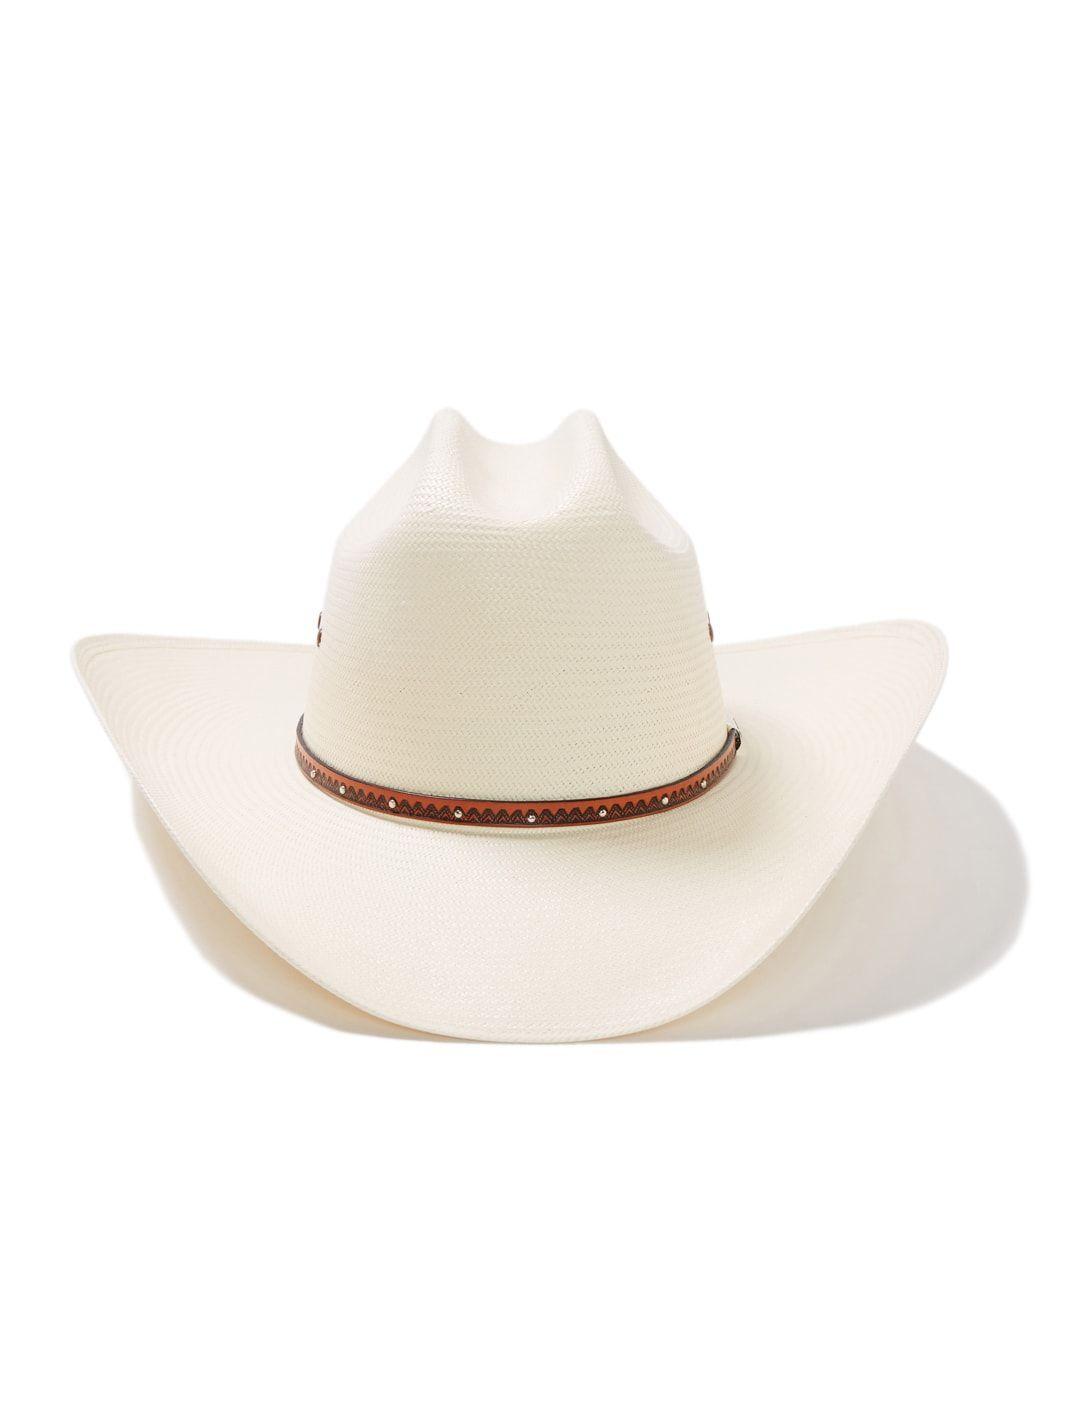 3e346984ede5e Stetson Men s Haywood 10X Straw Cowboy Hat SSHYWD6642. Details